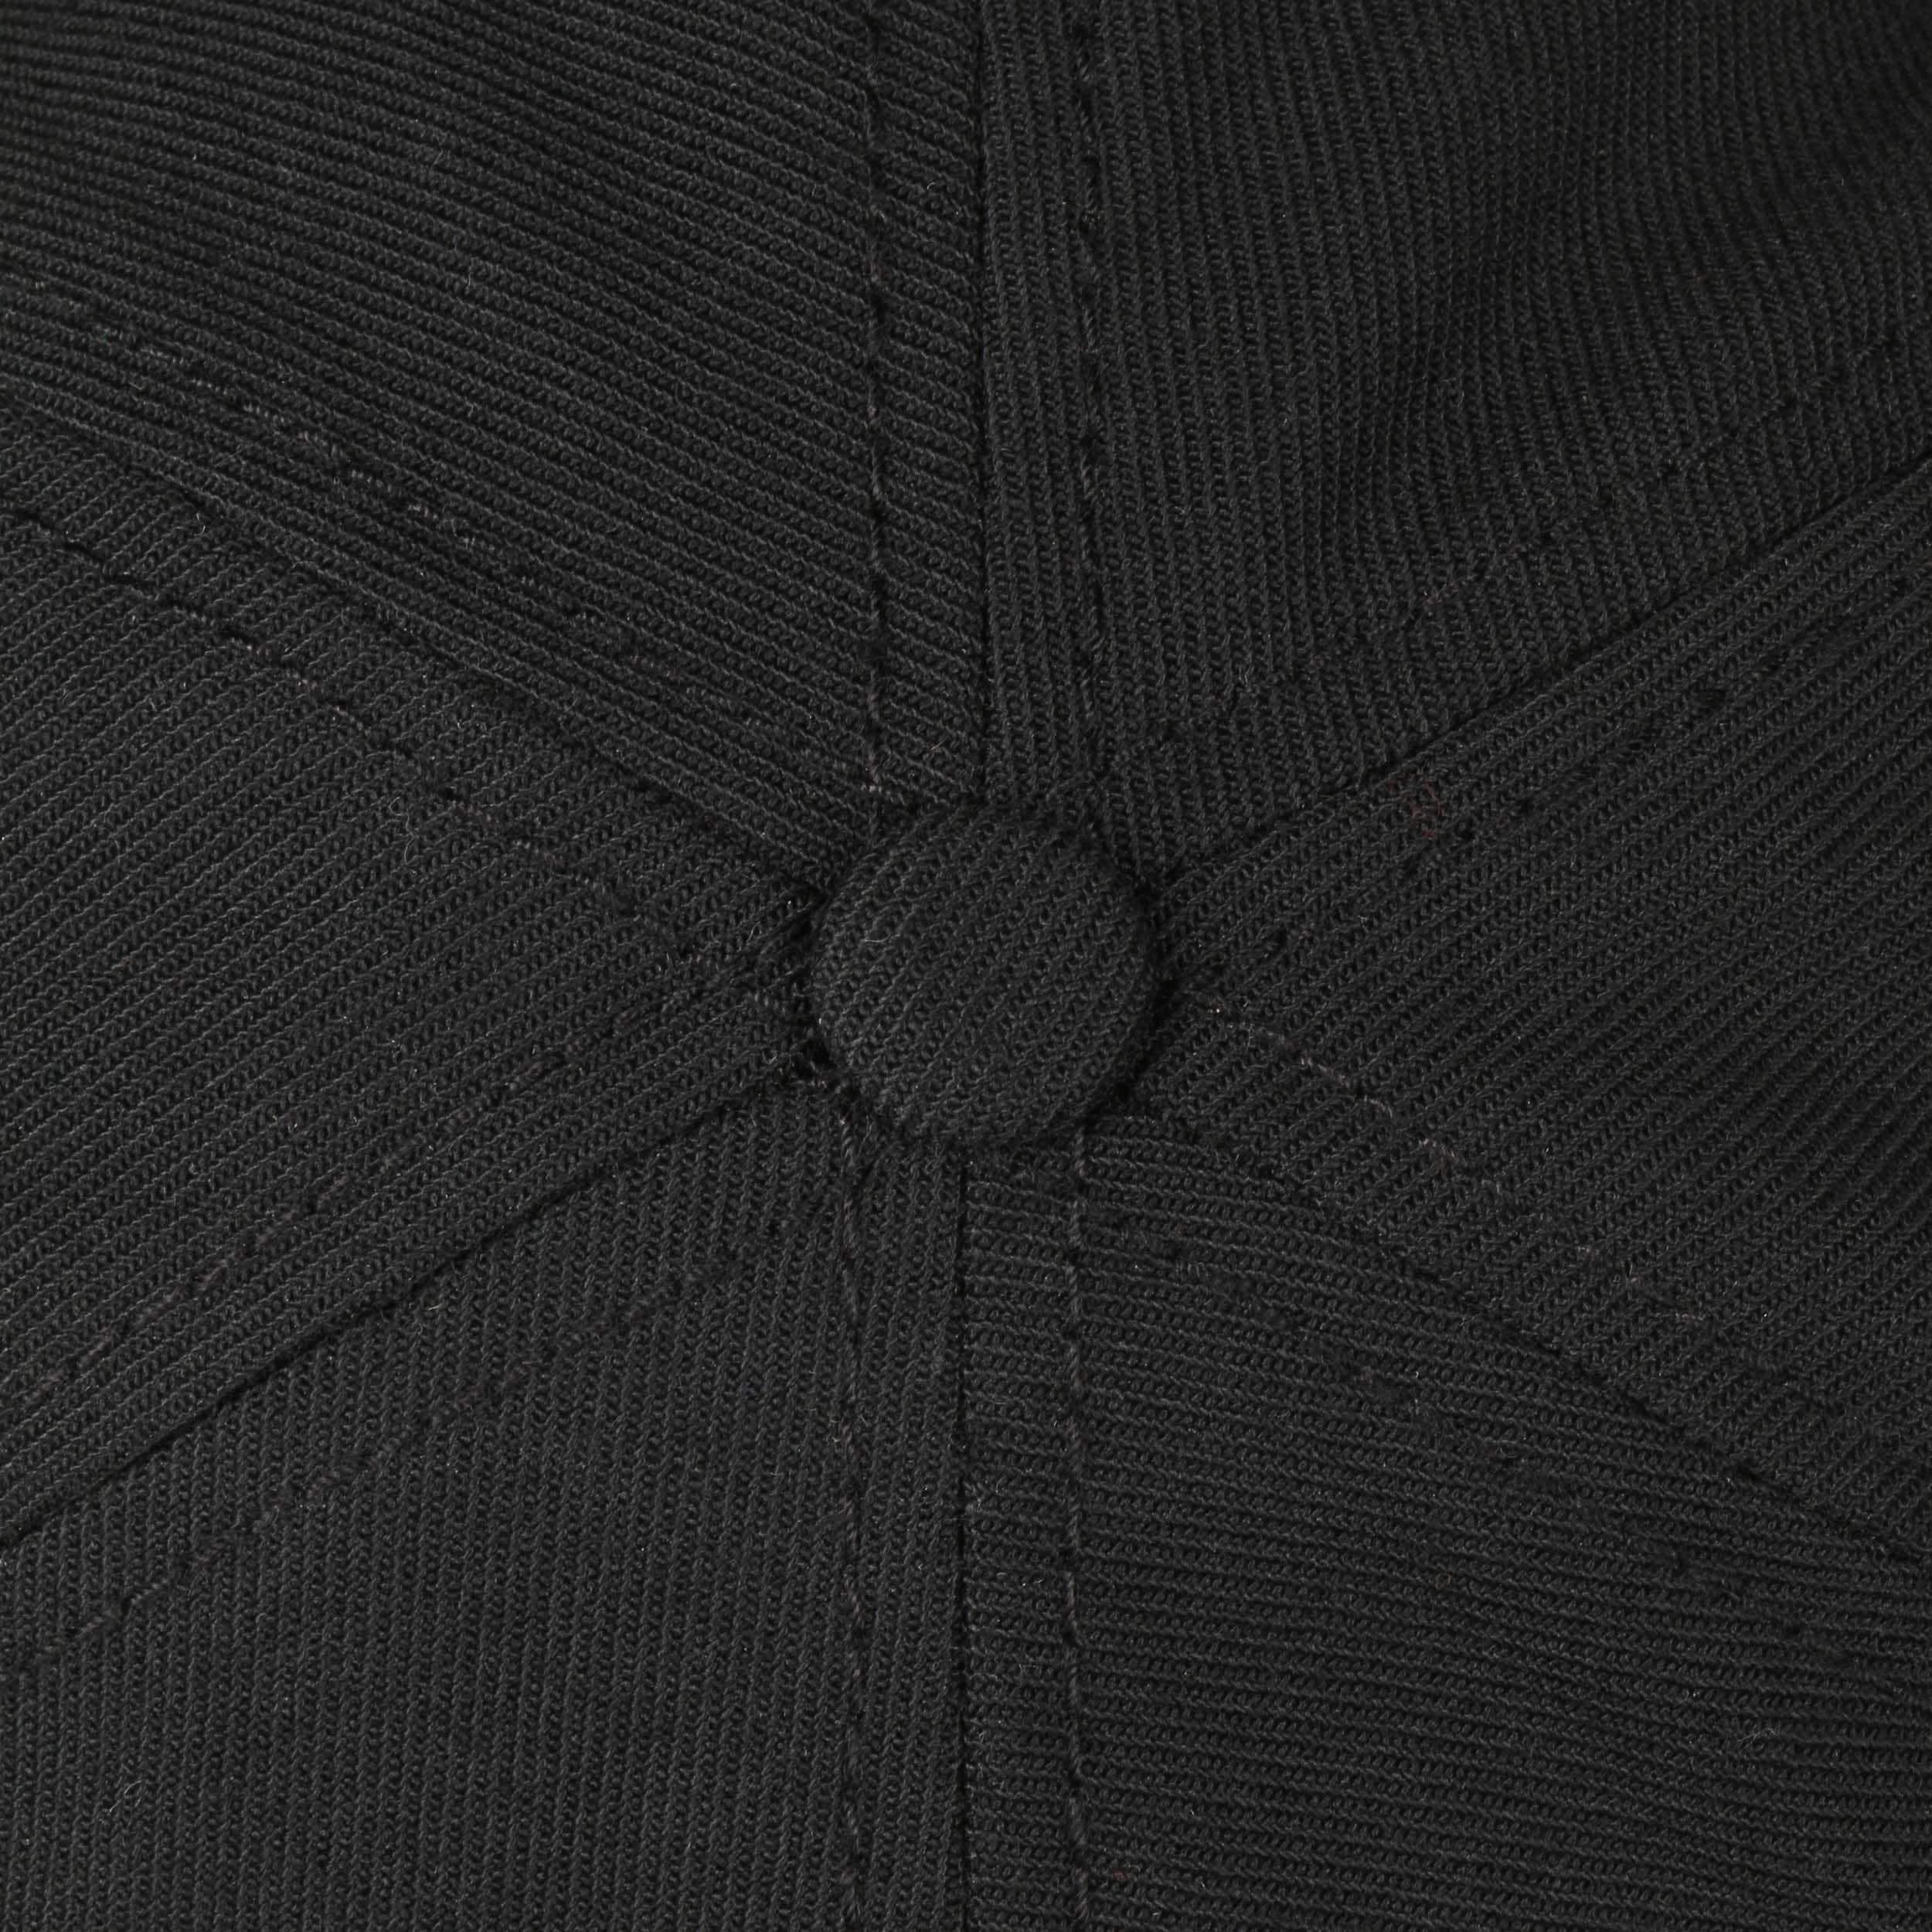 344c82d4fe5 ... Star Chev Fall Weight Cap by Converse - black 5 ...